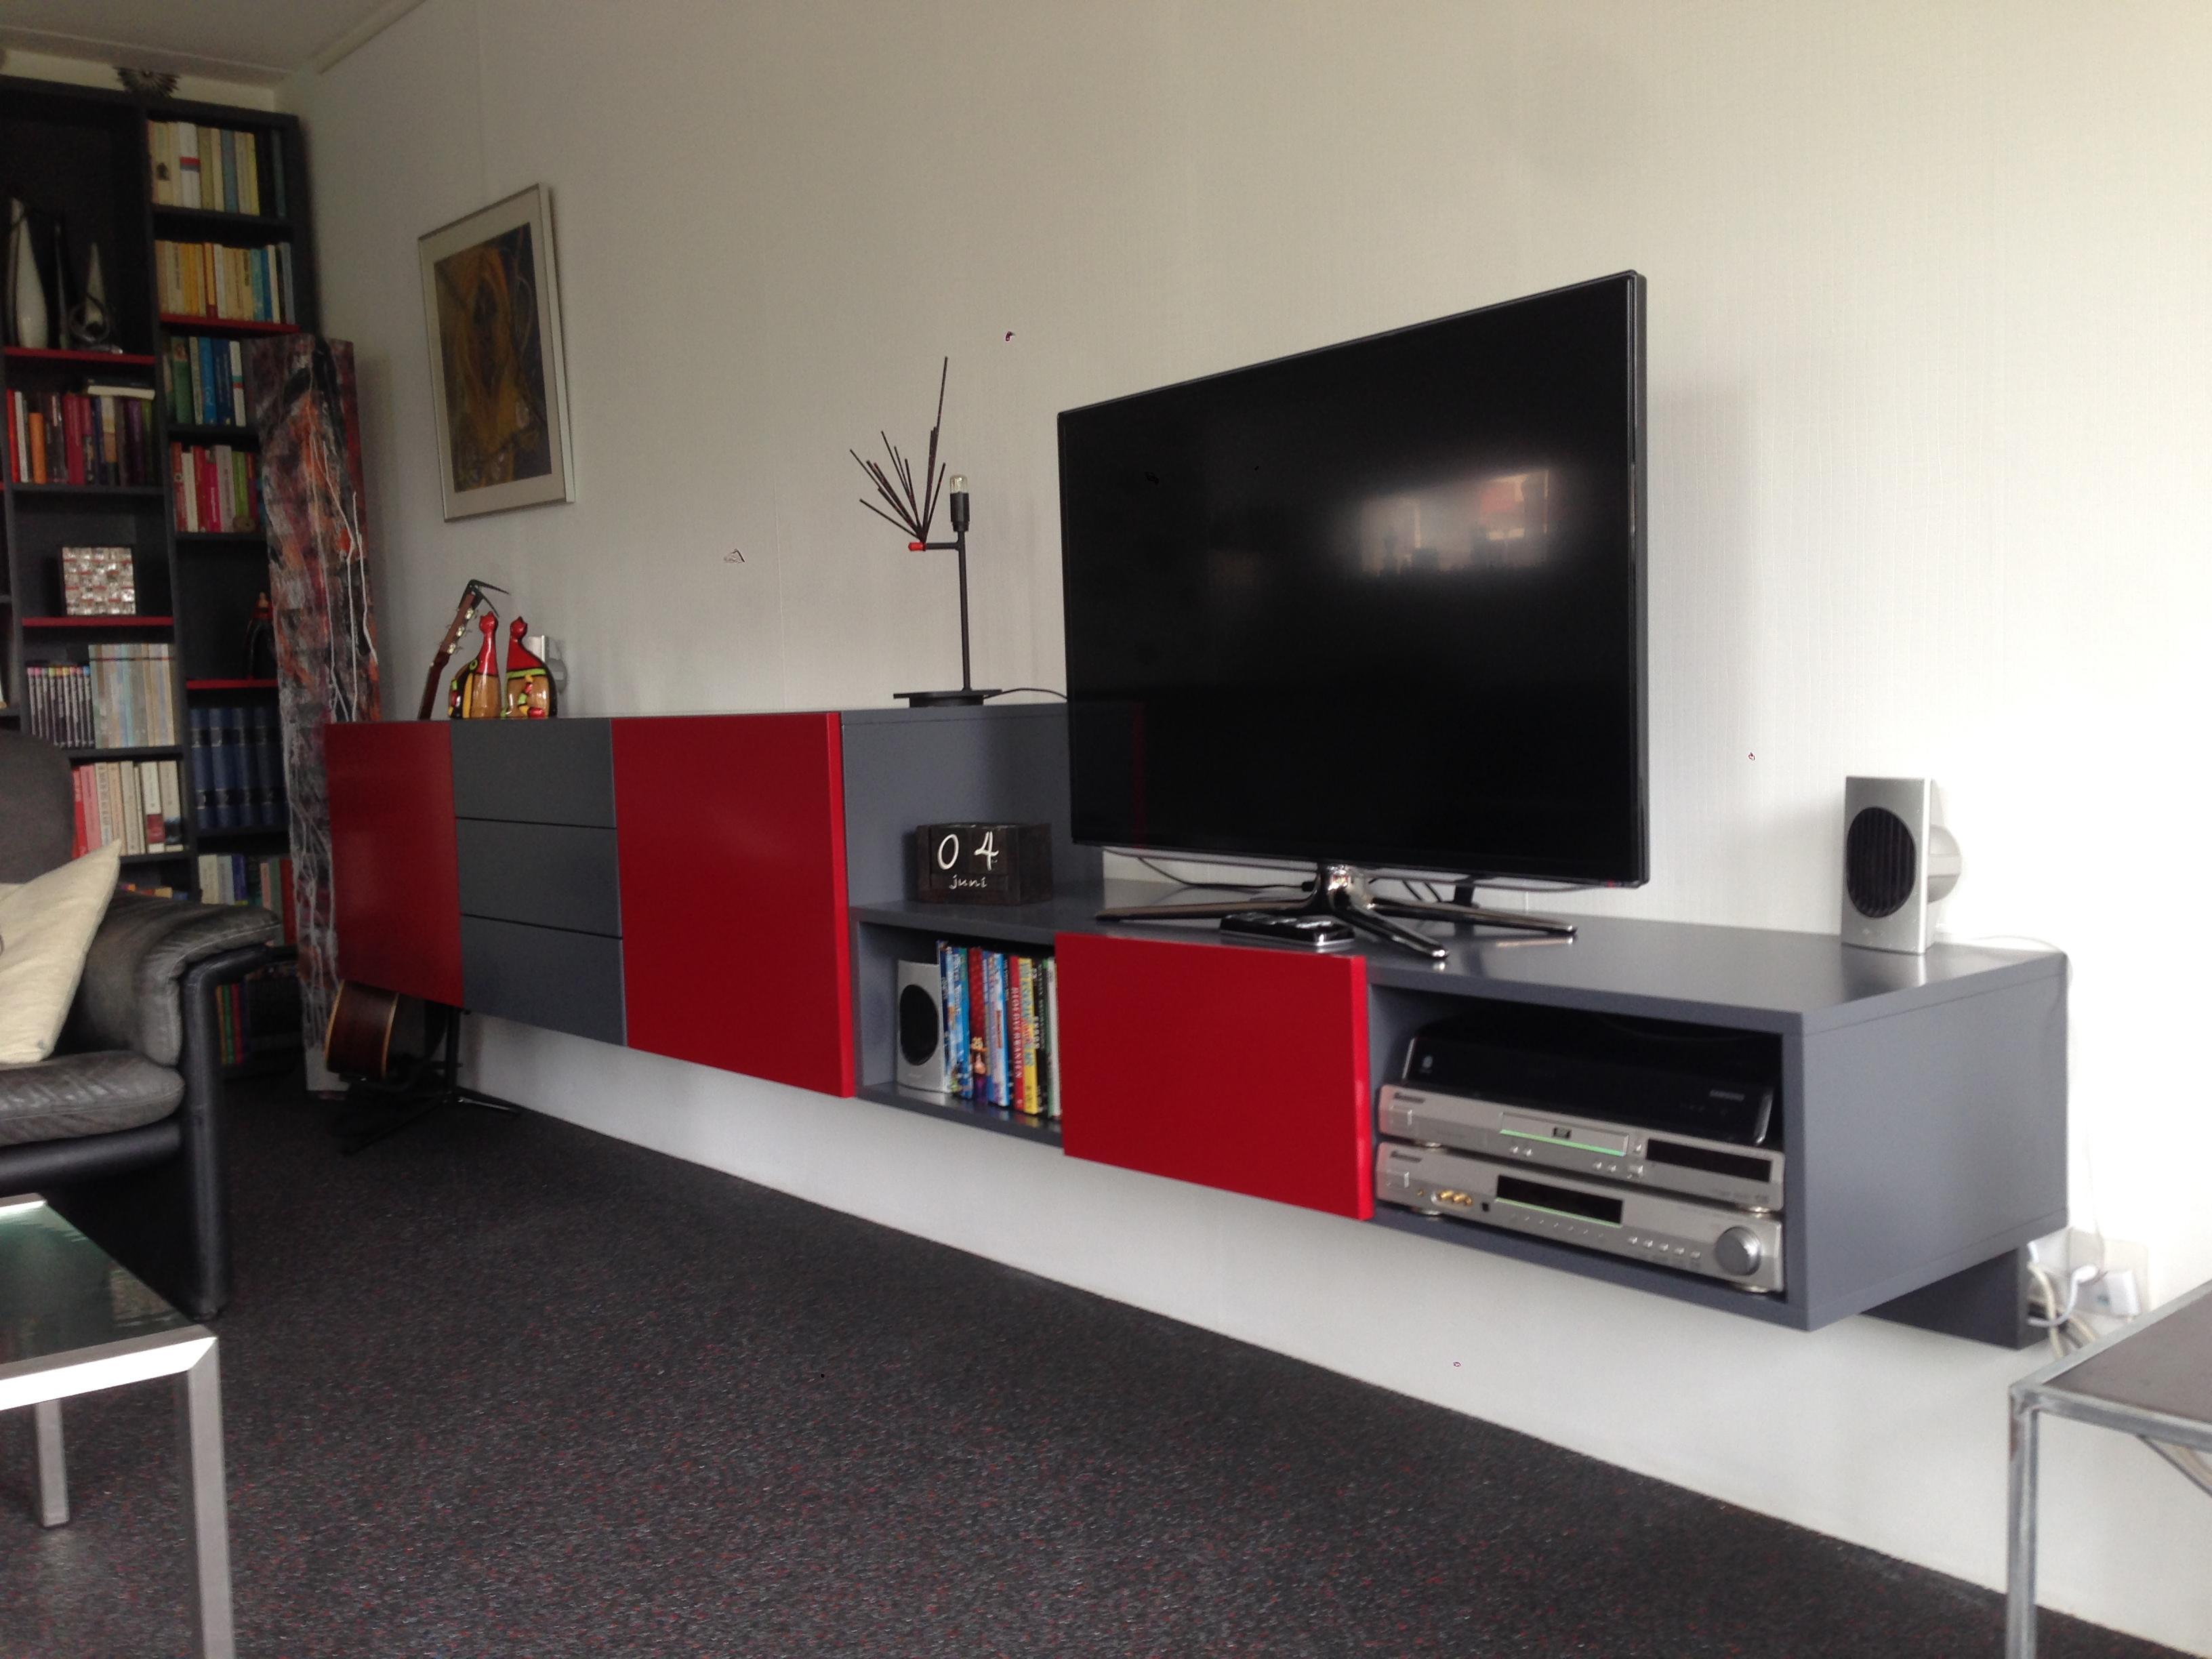 zwevend audio wandkast in grey-red